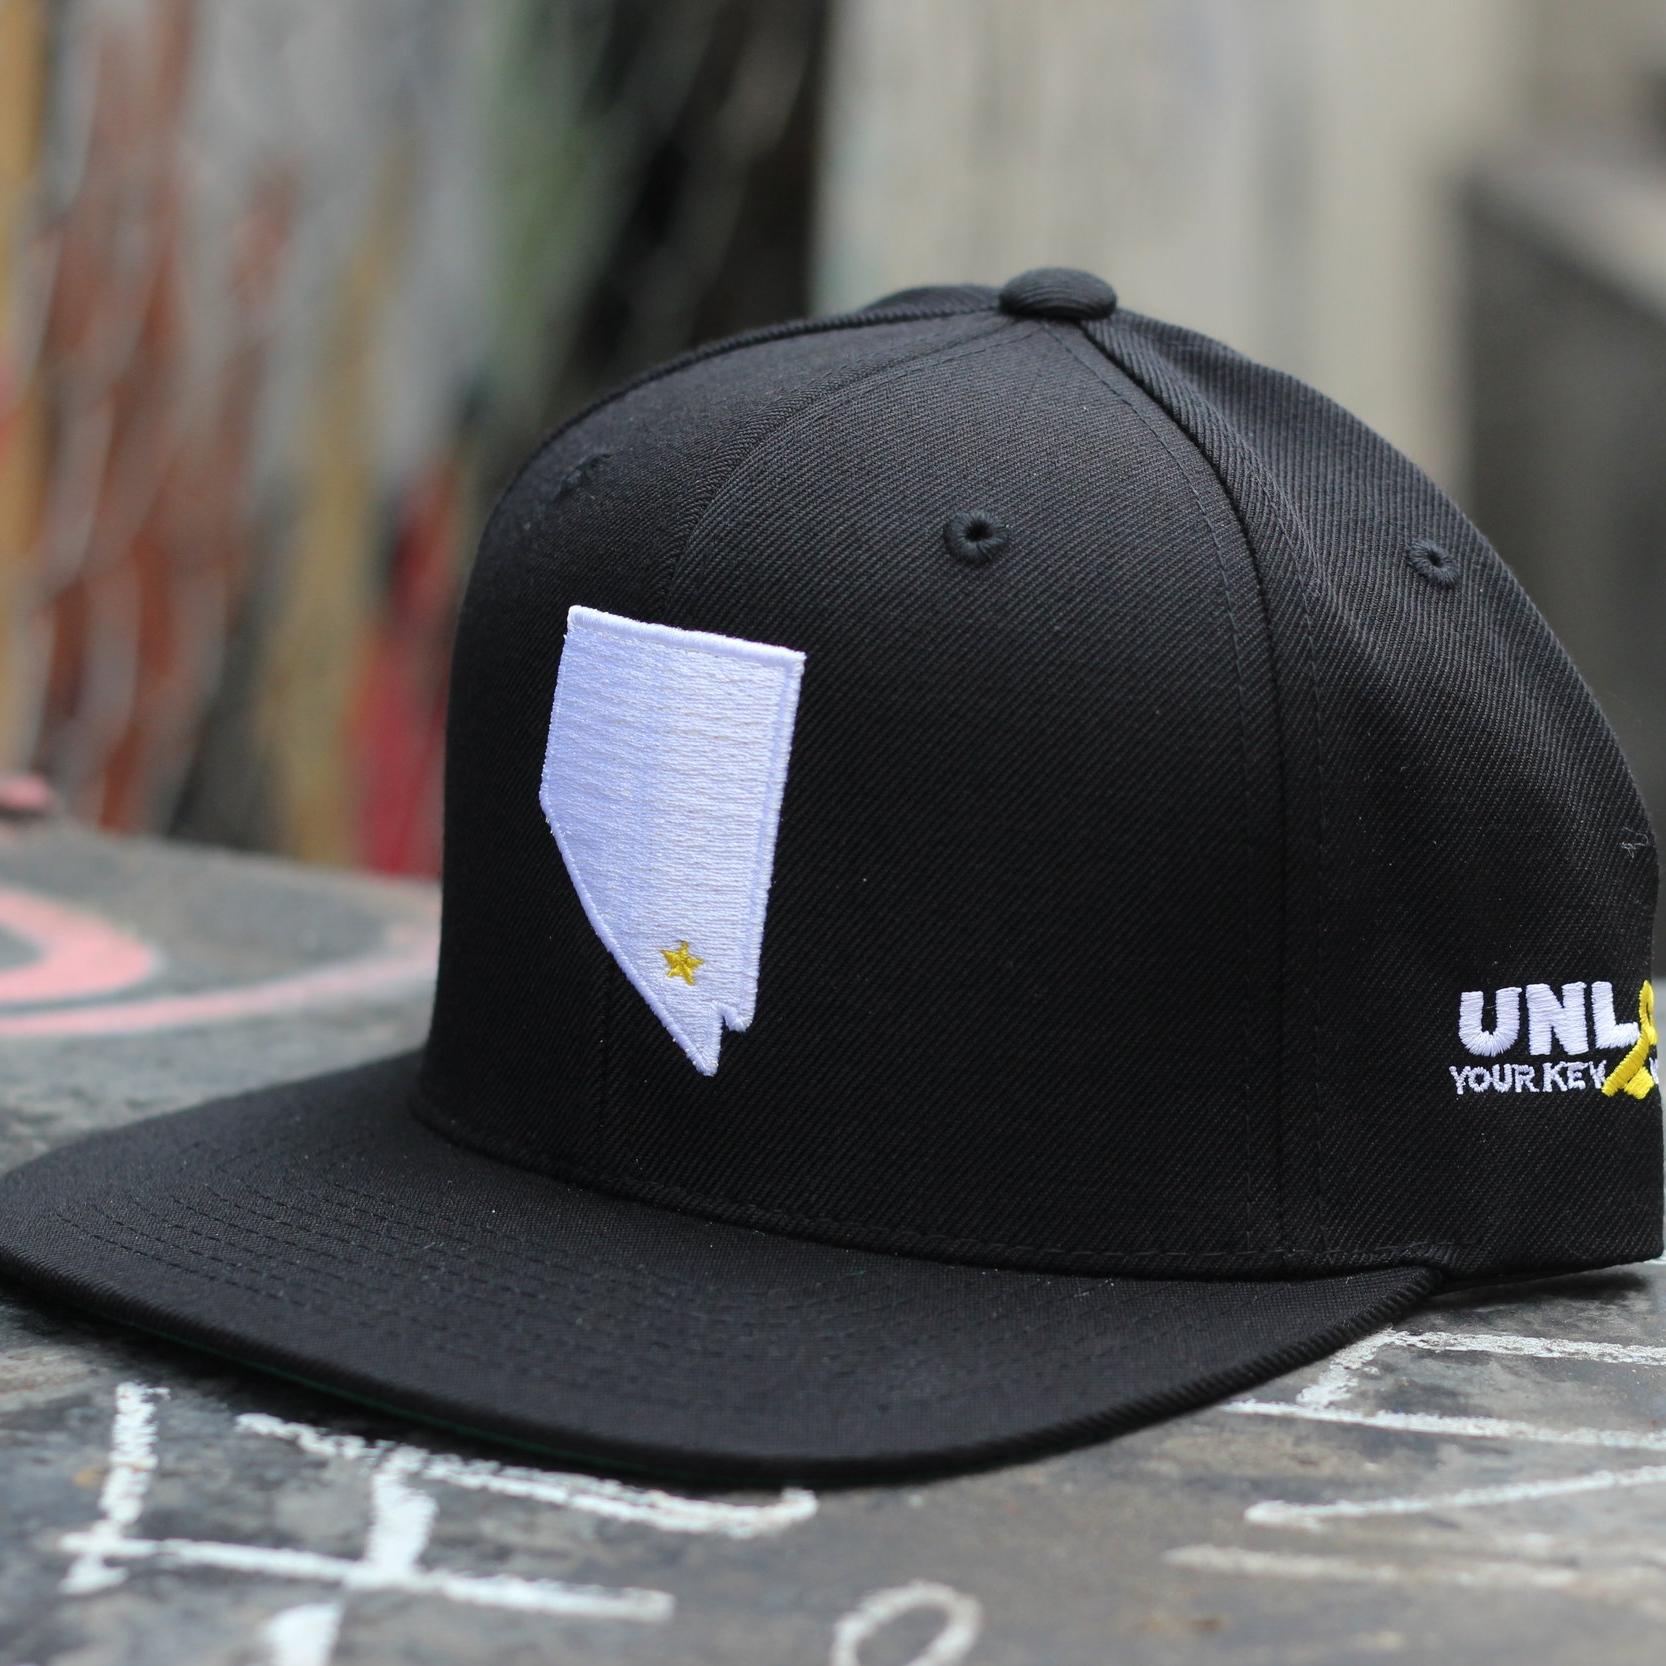 Unlokt Snapback Hat